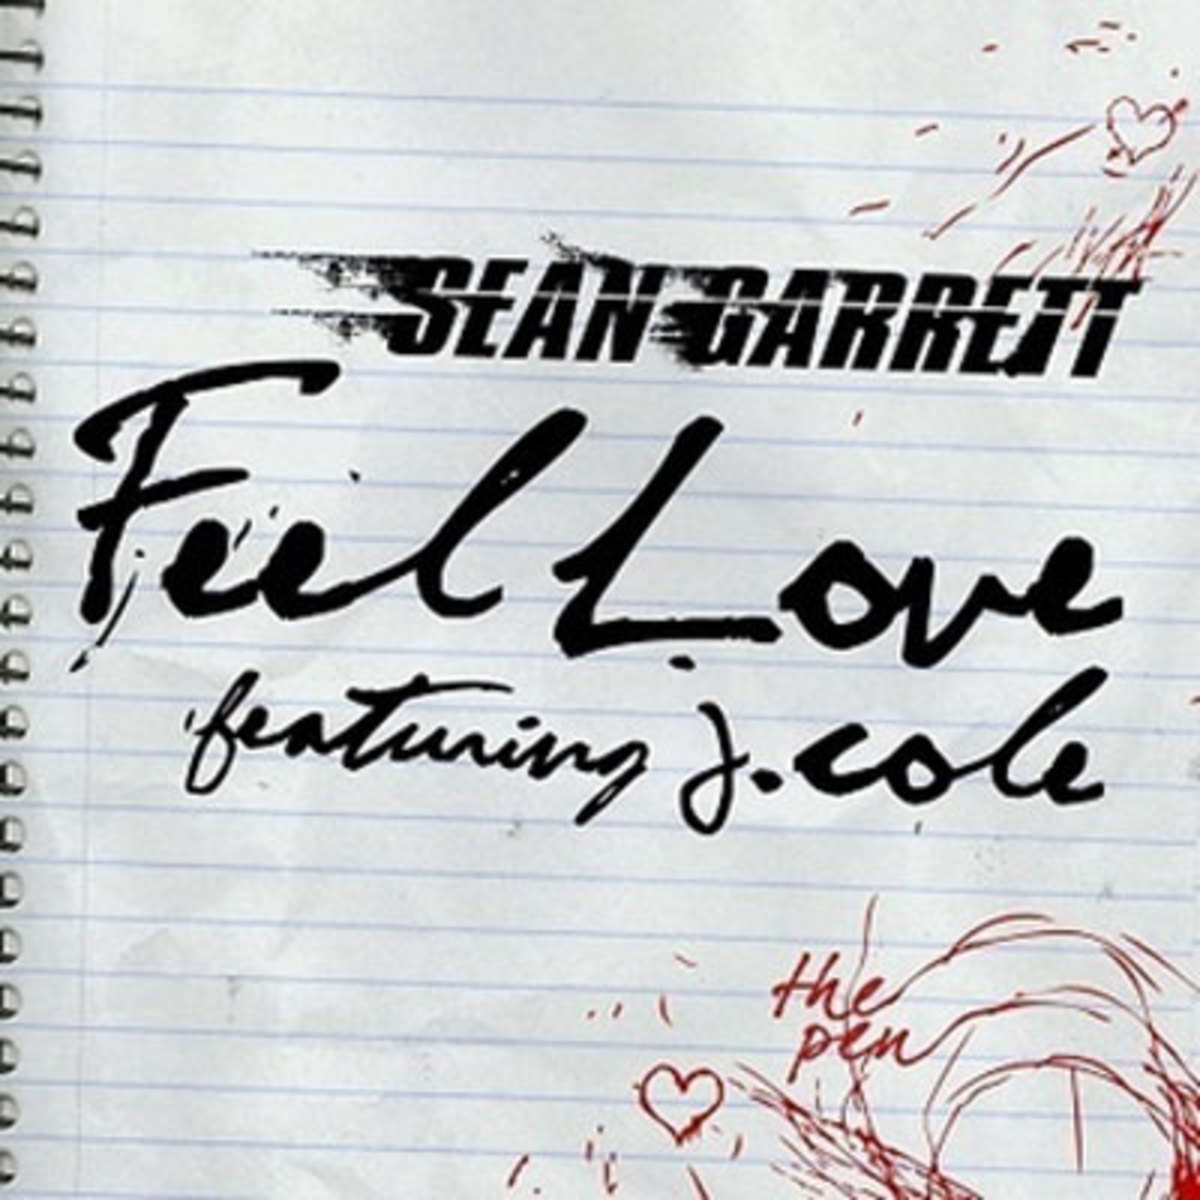 seangarrett-feellove2.jpg